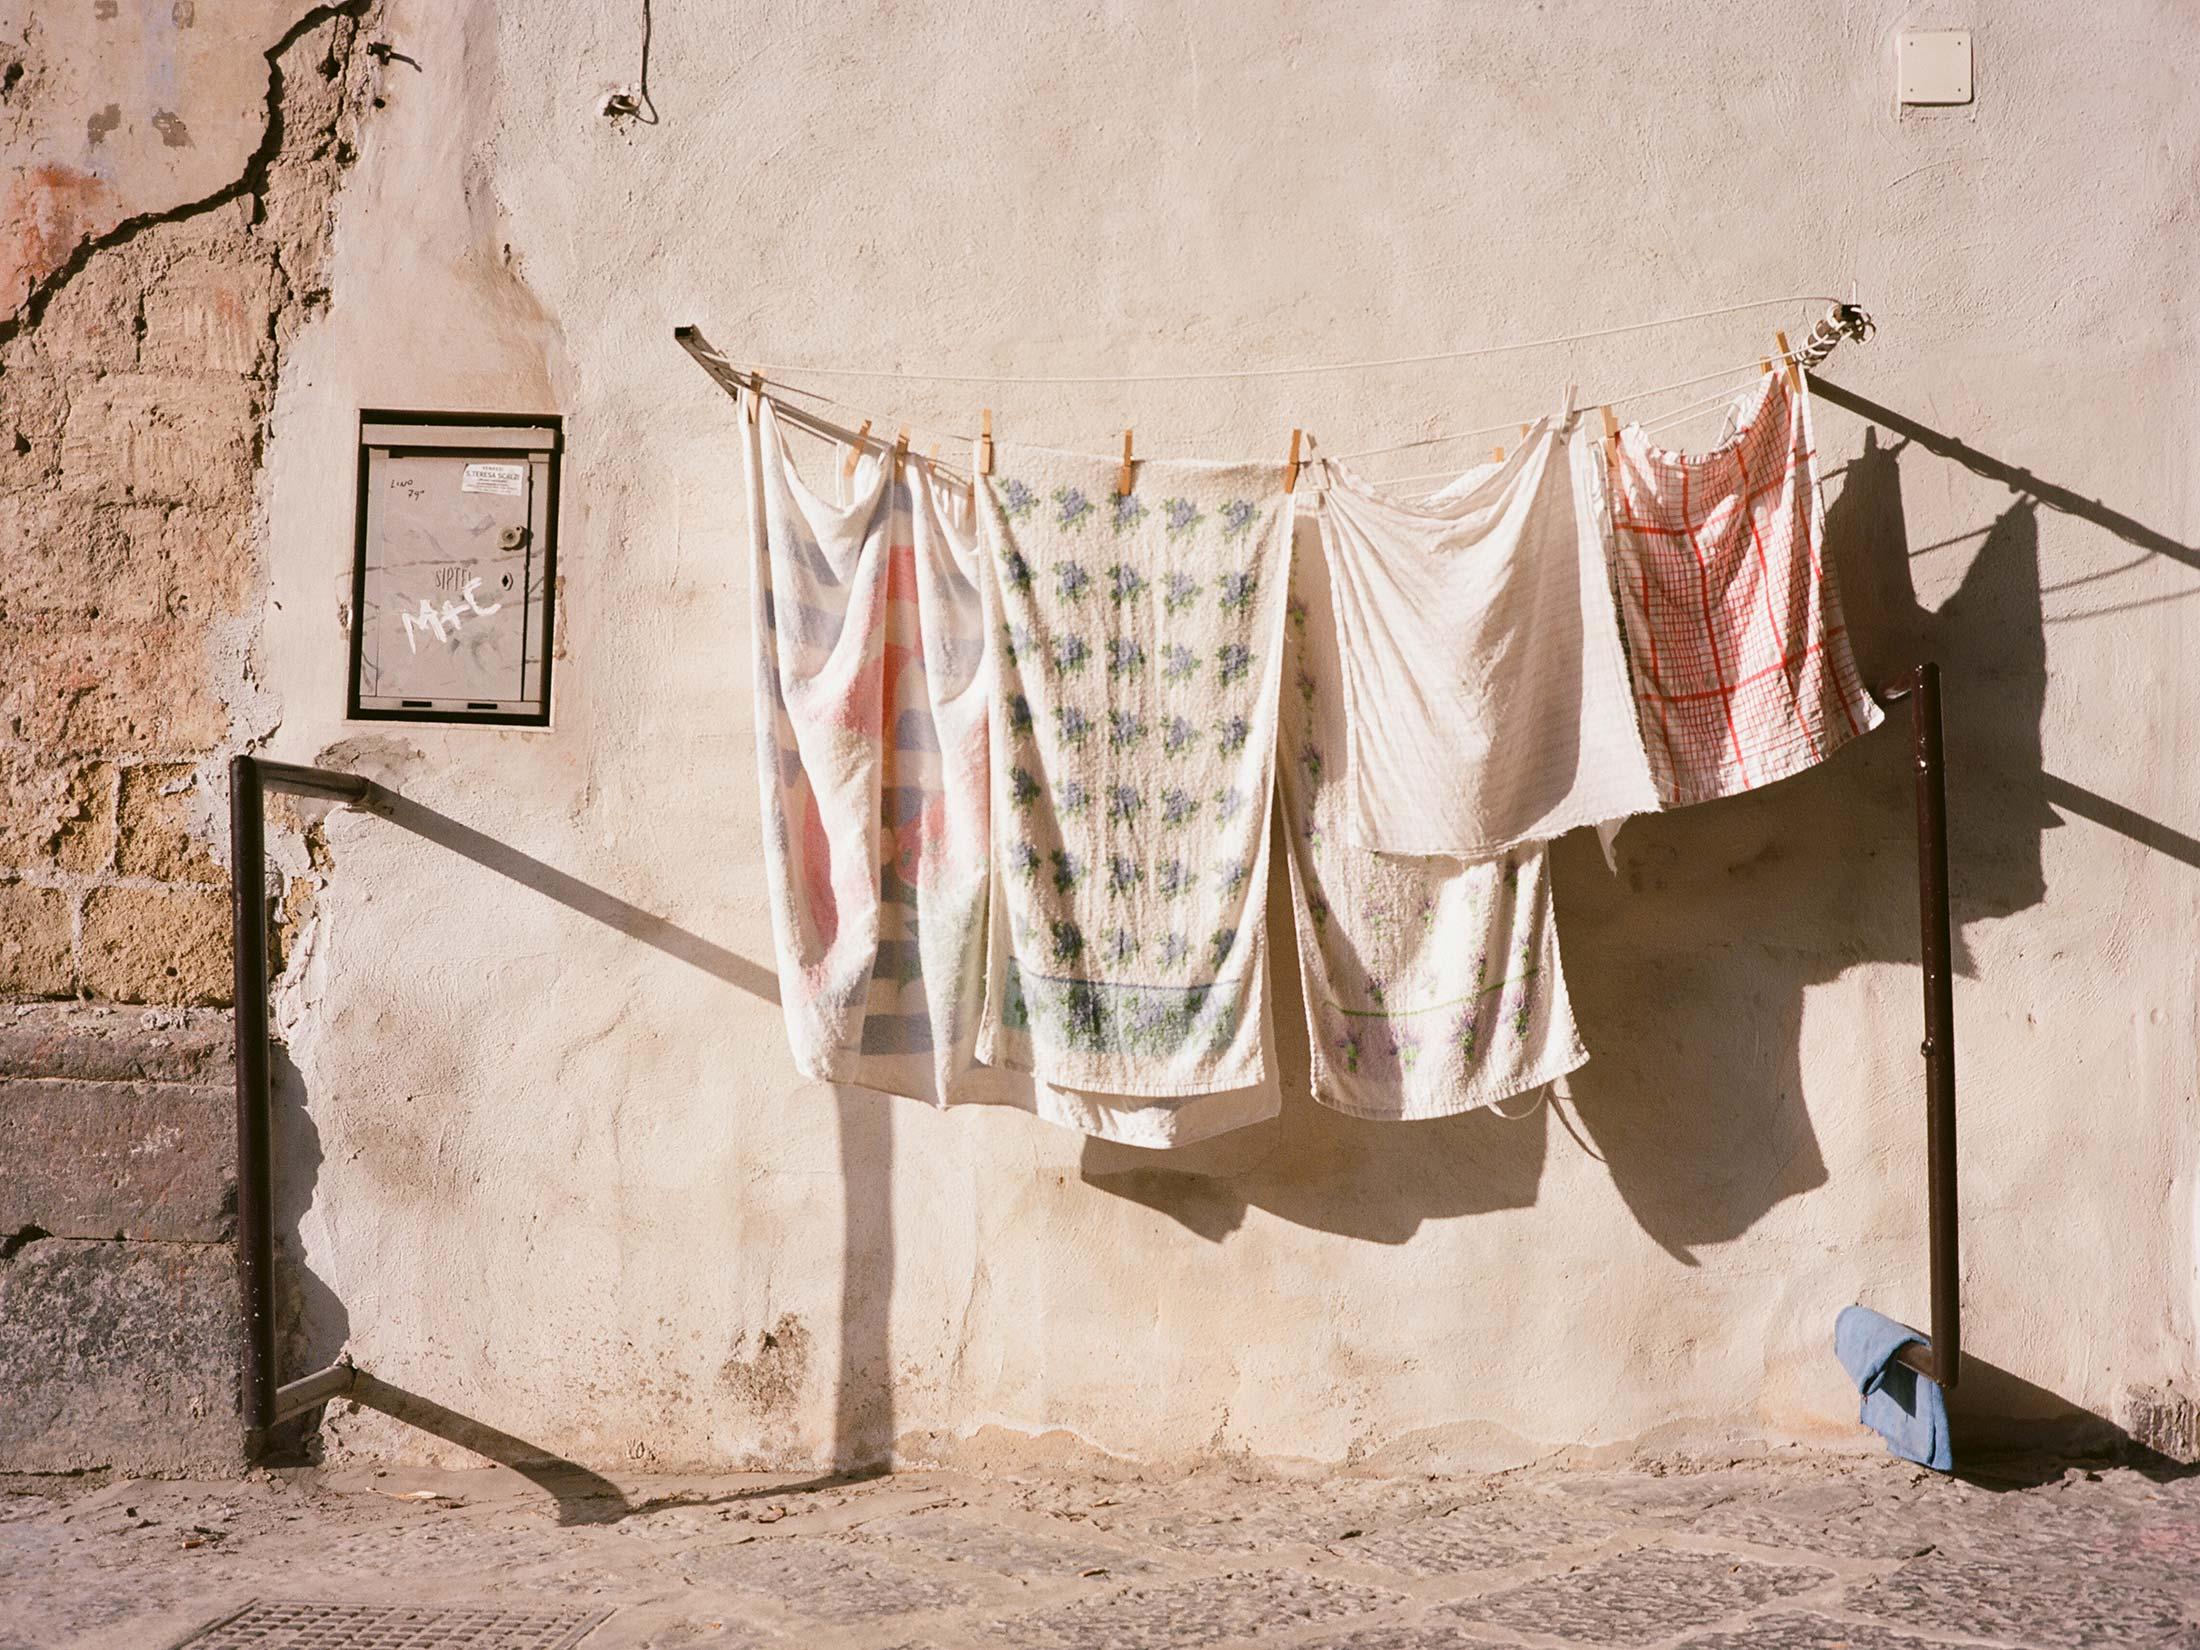 Naples_Laundry_01.jpg